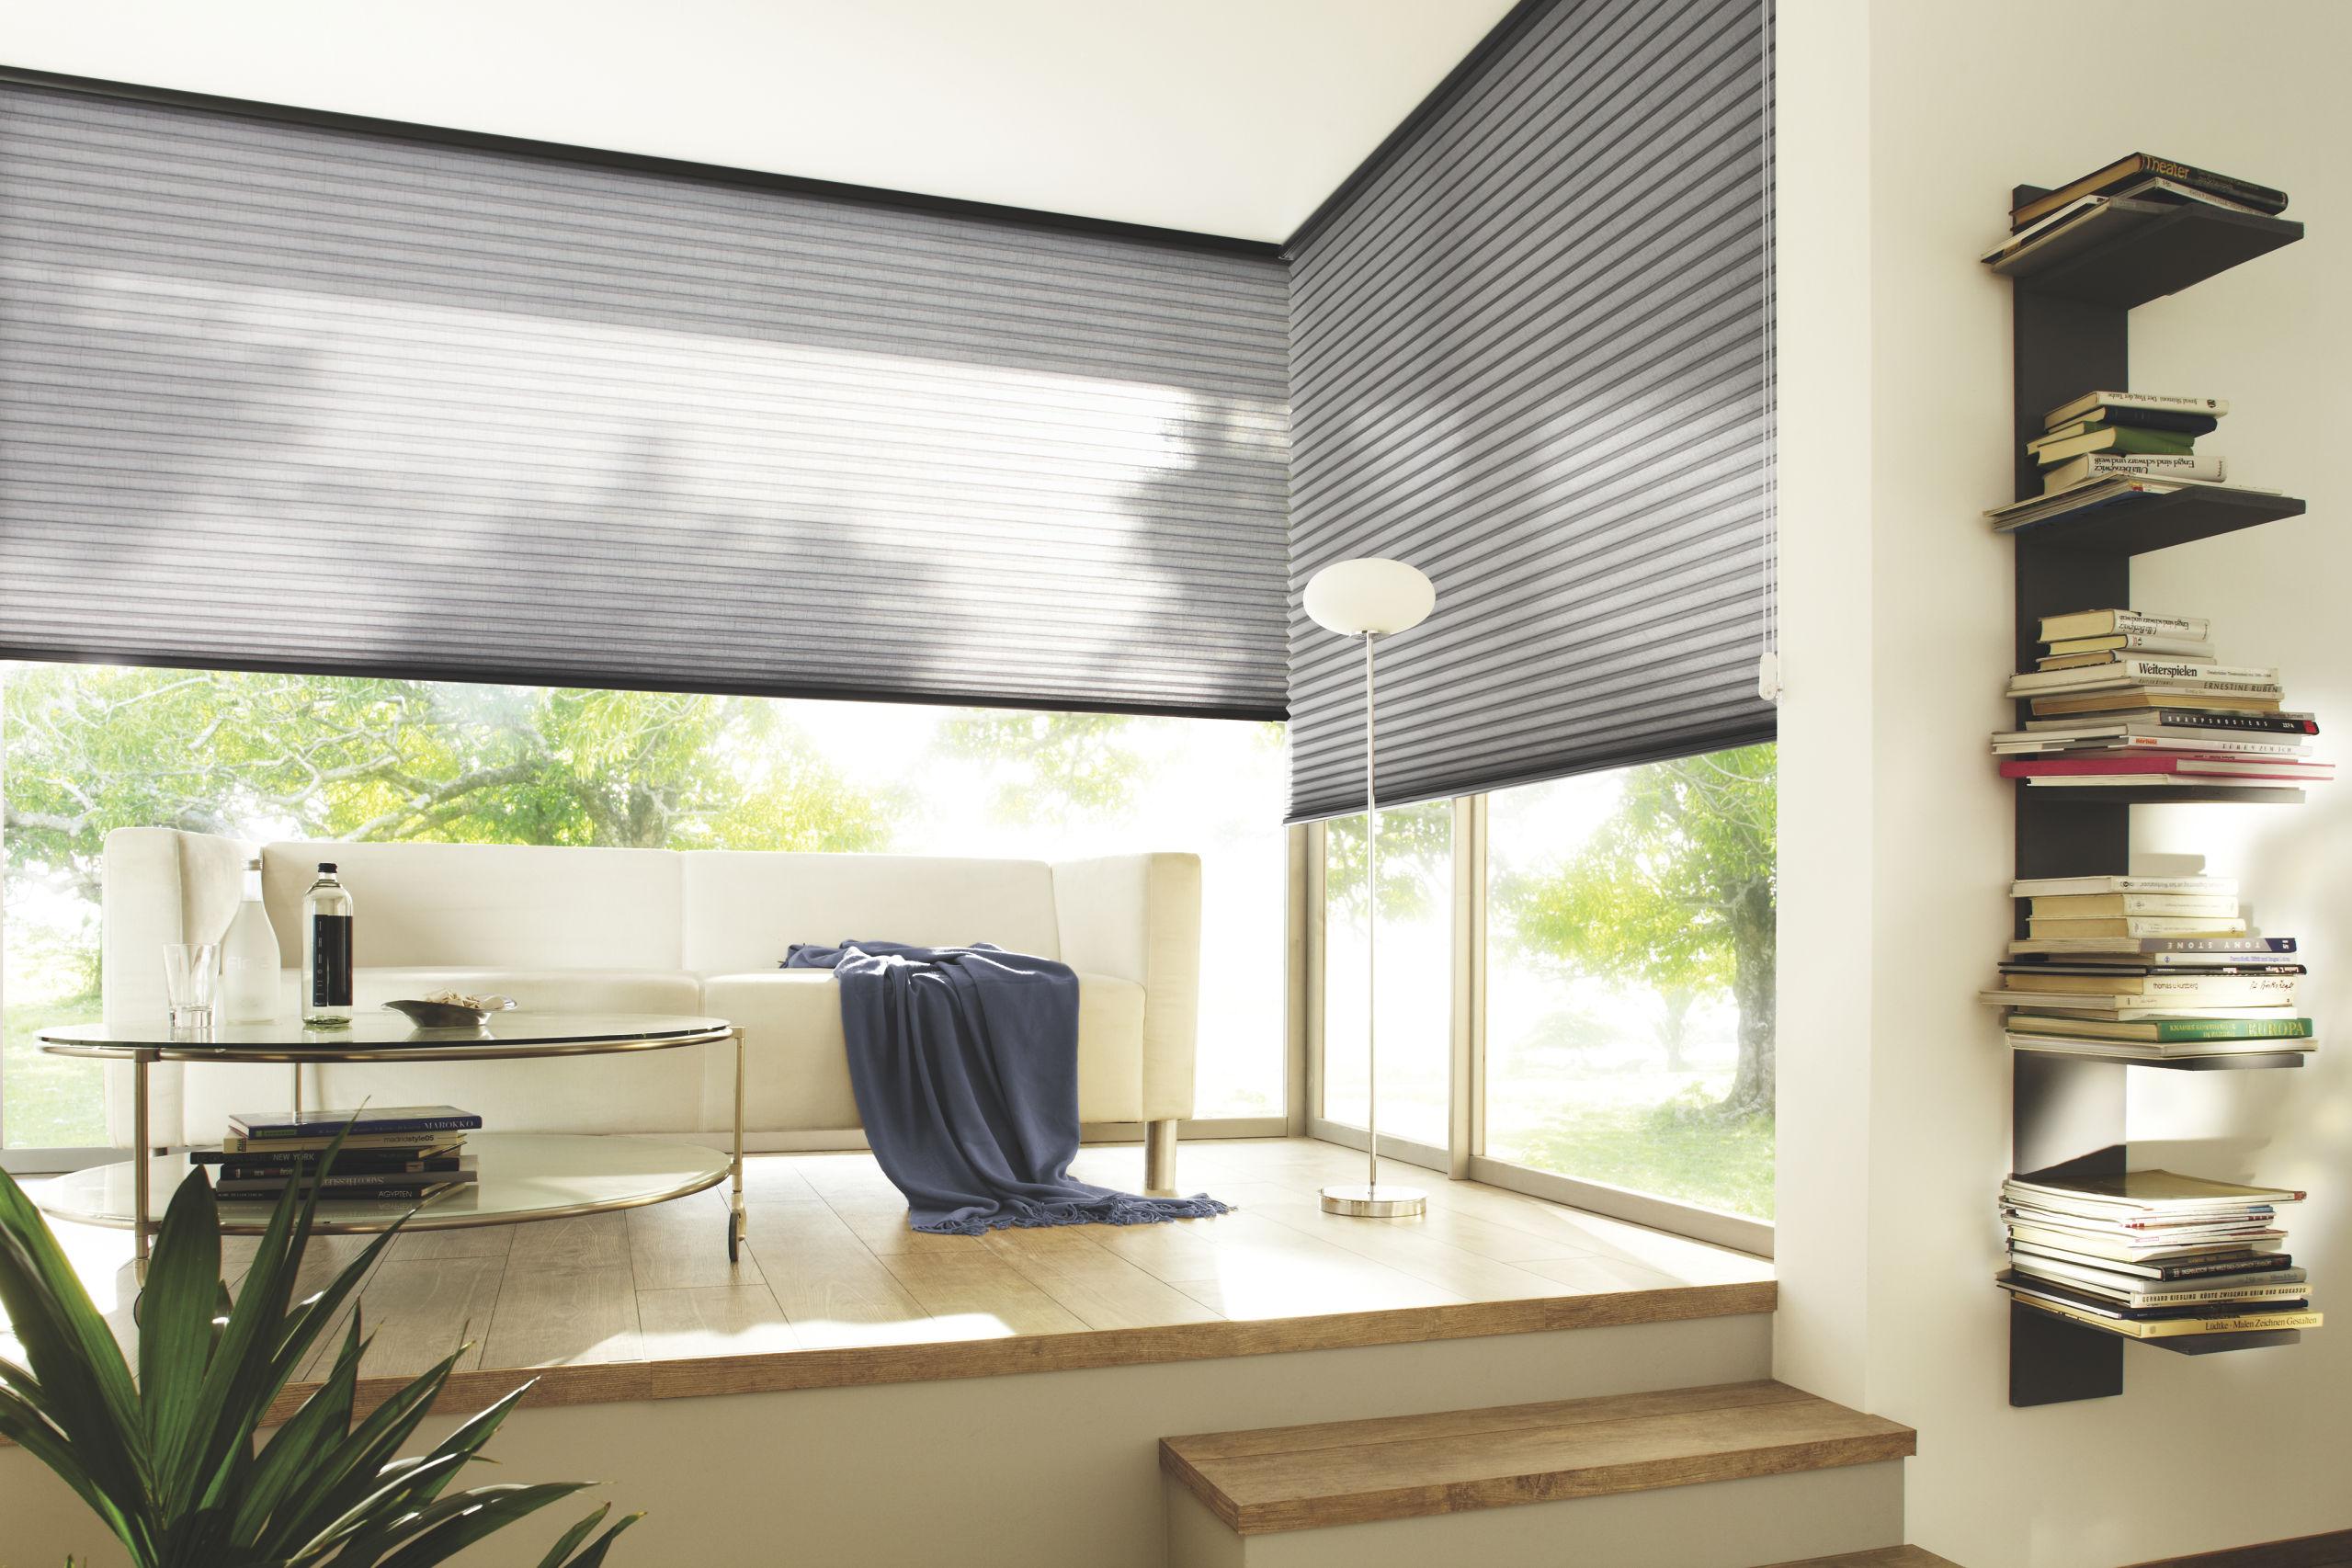 plissee faltstore raumausstattung gauweiler speyer. Black Bedroom Furniture Sets. Home Design Ideas